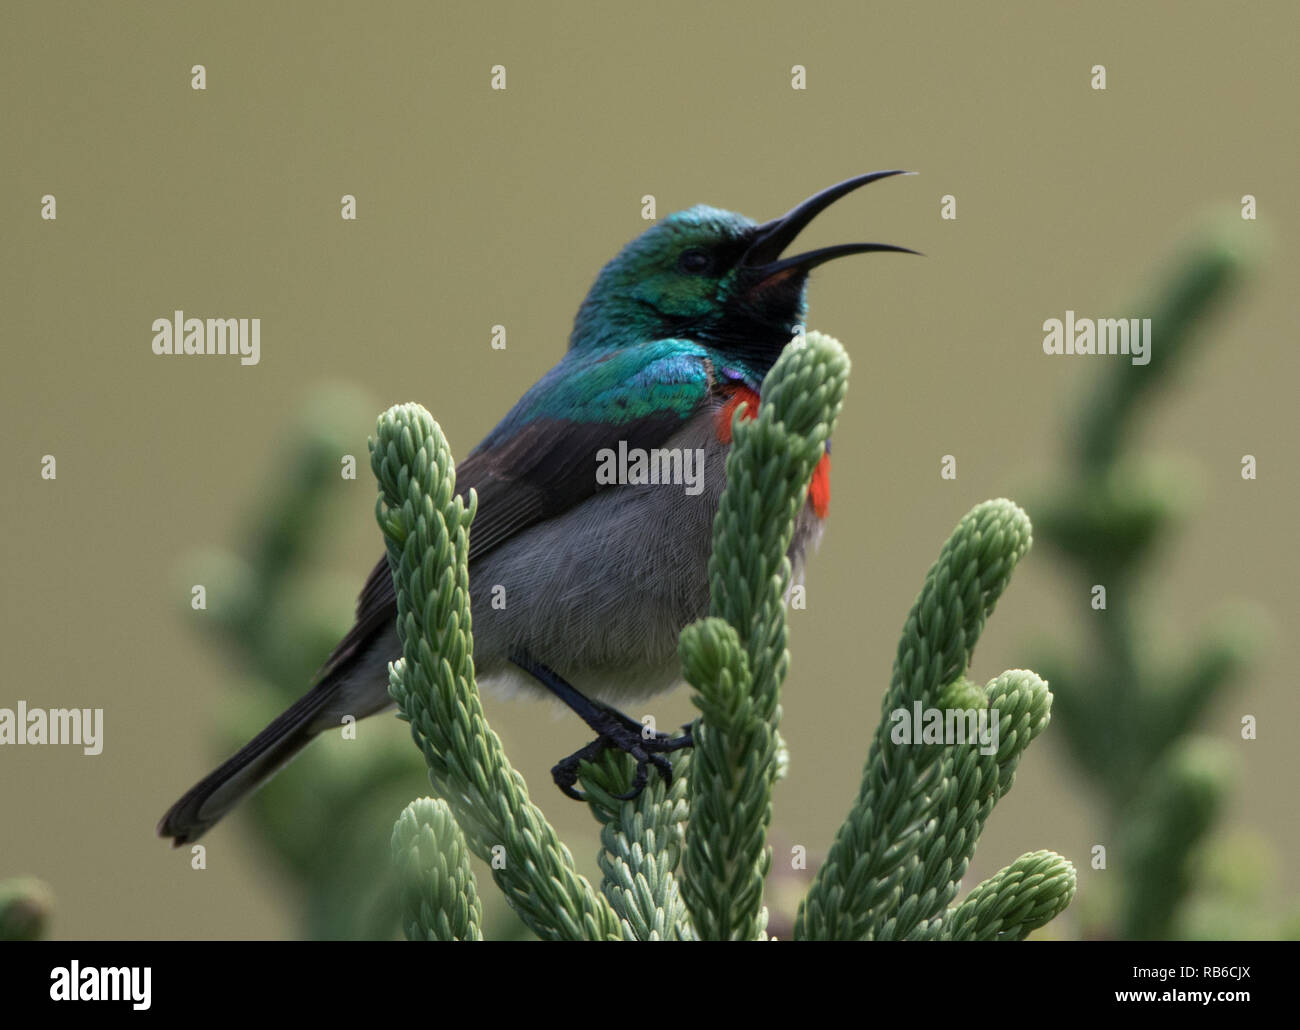 Southern Double-collared Sunbird (Cinnyris chalybeus) - Stock Image